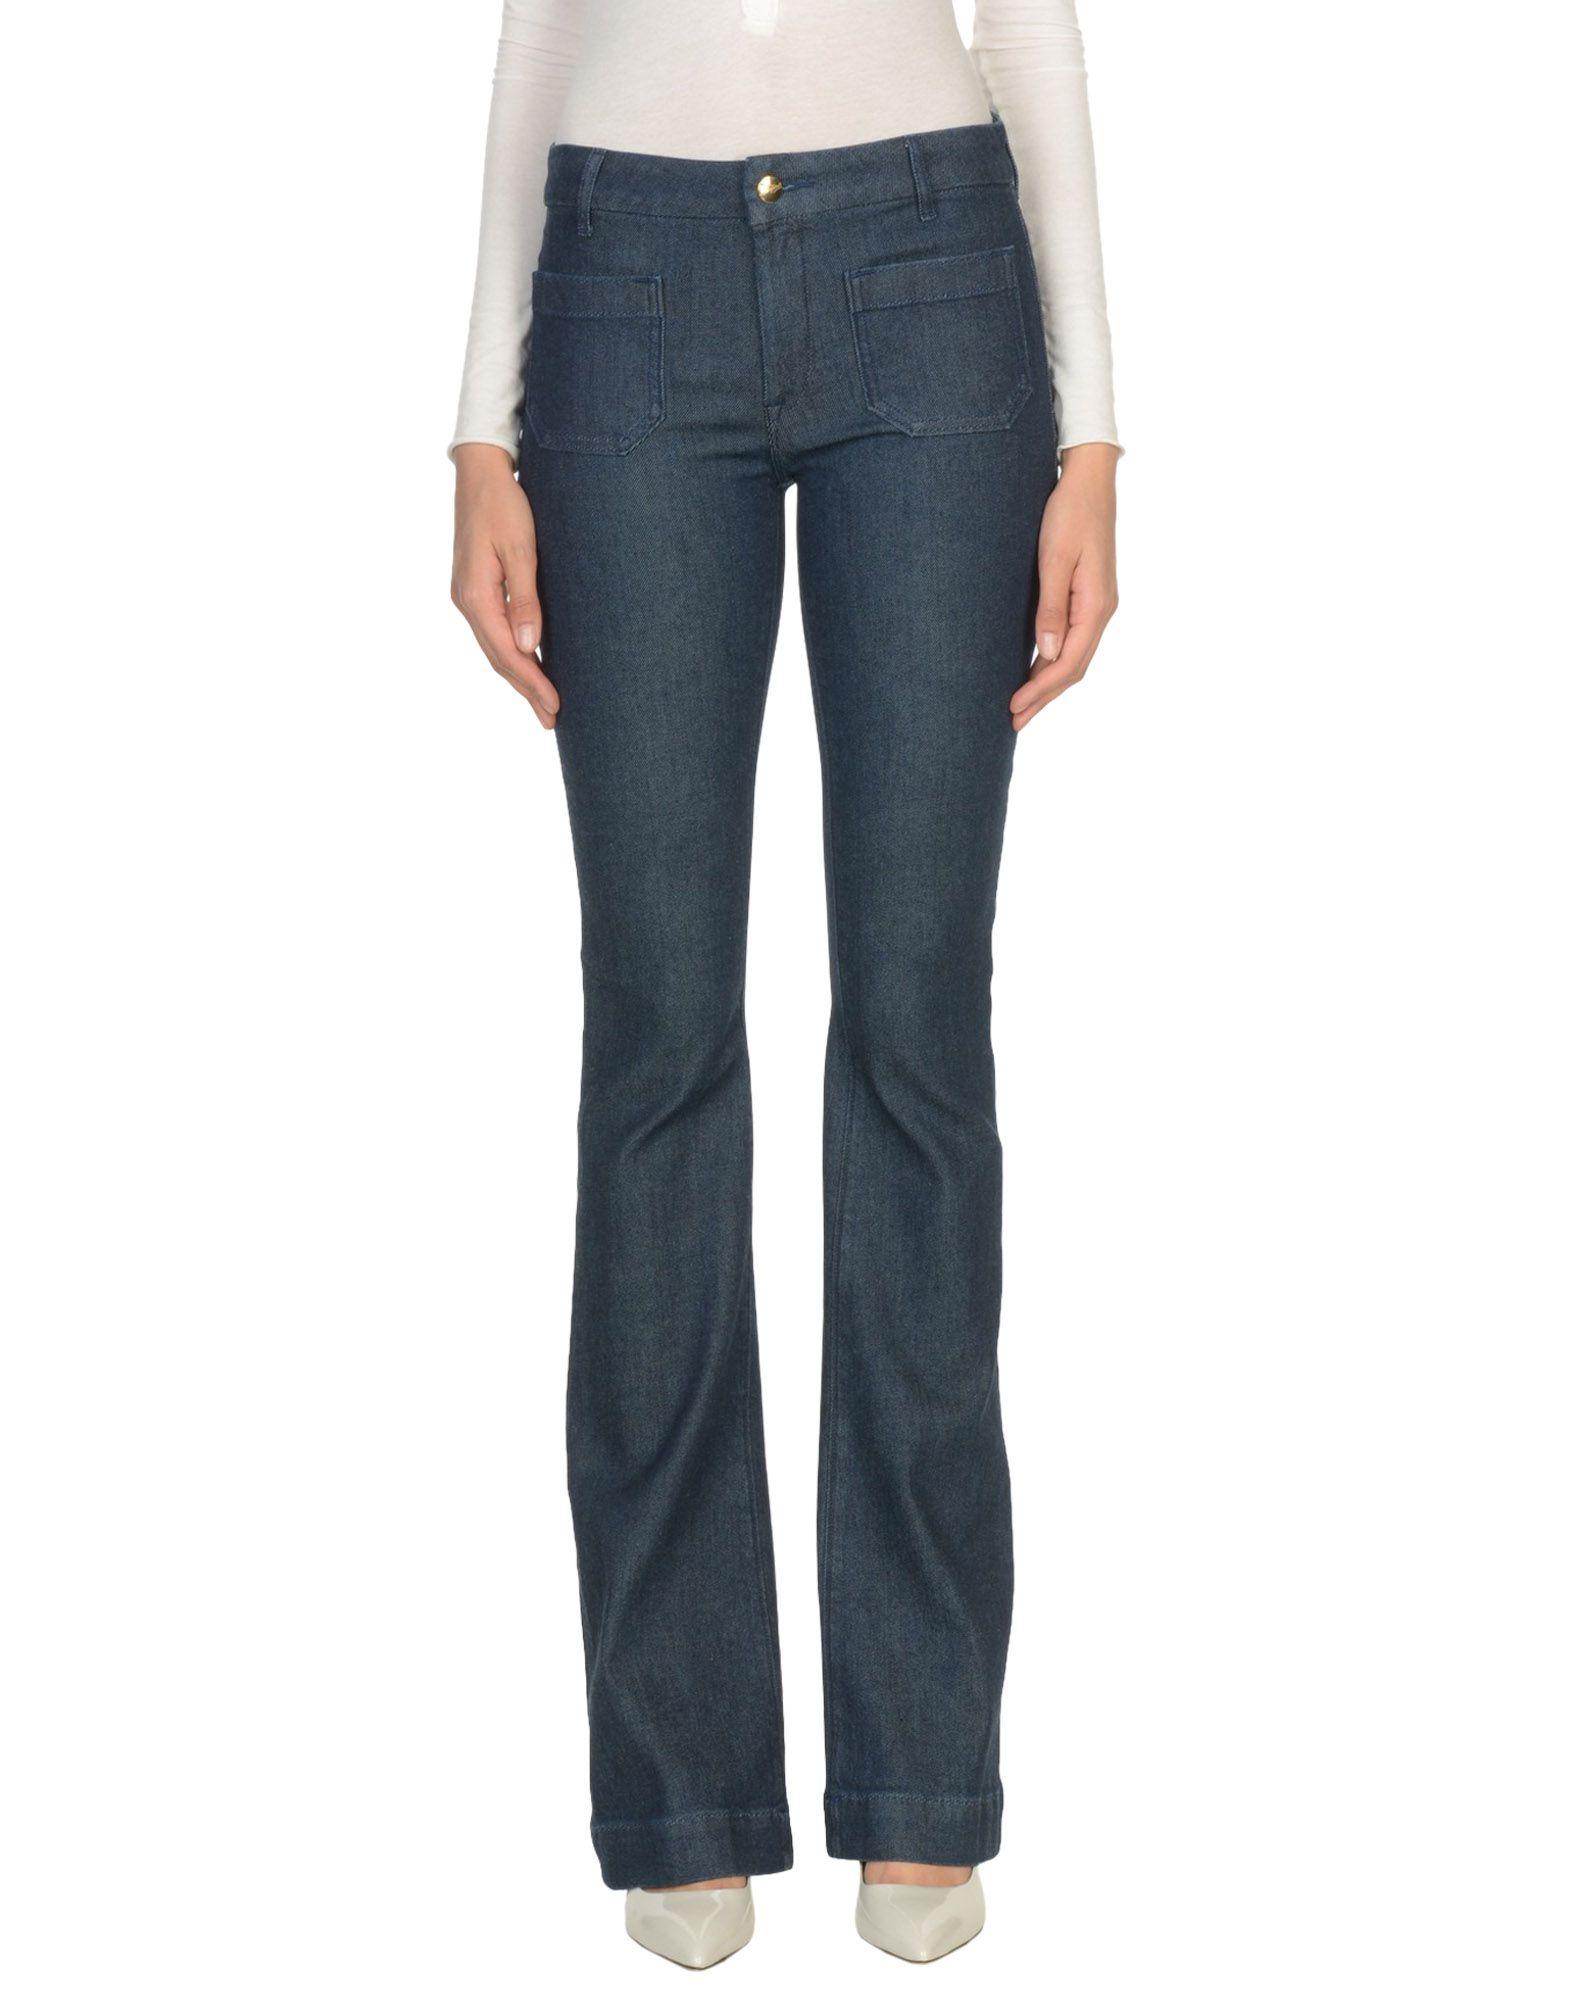 Pantaloni Jeans The Seafarer Donna - Acquista online su 6TYLj